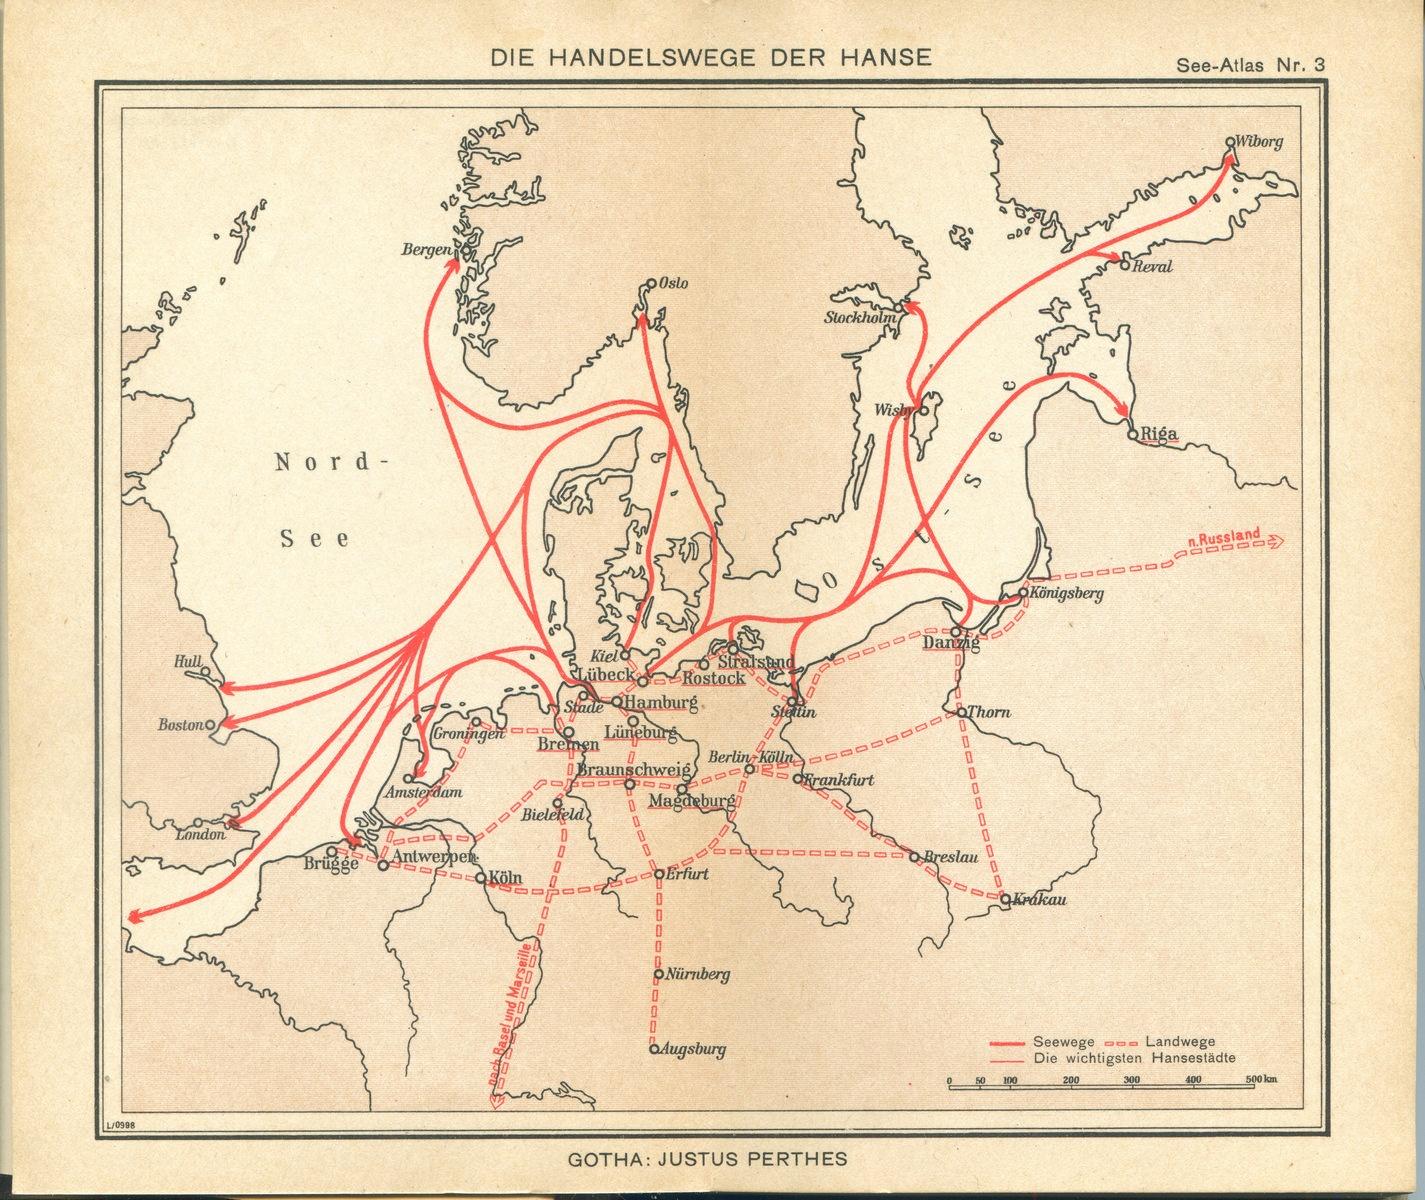 Die Handelswege der Hanse